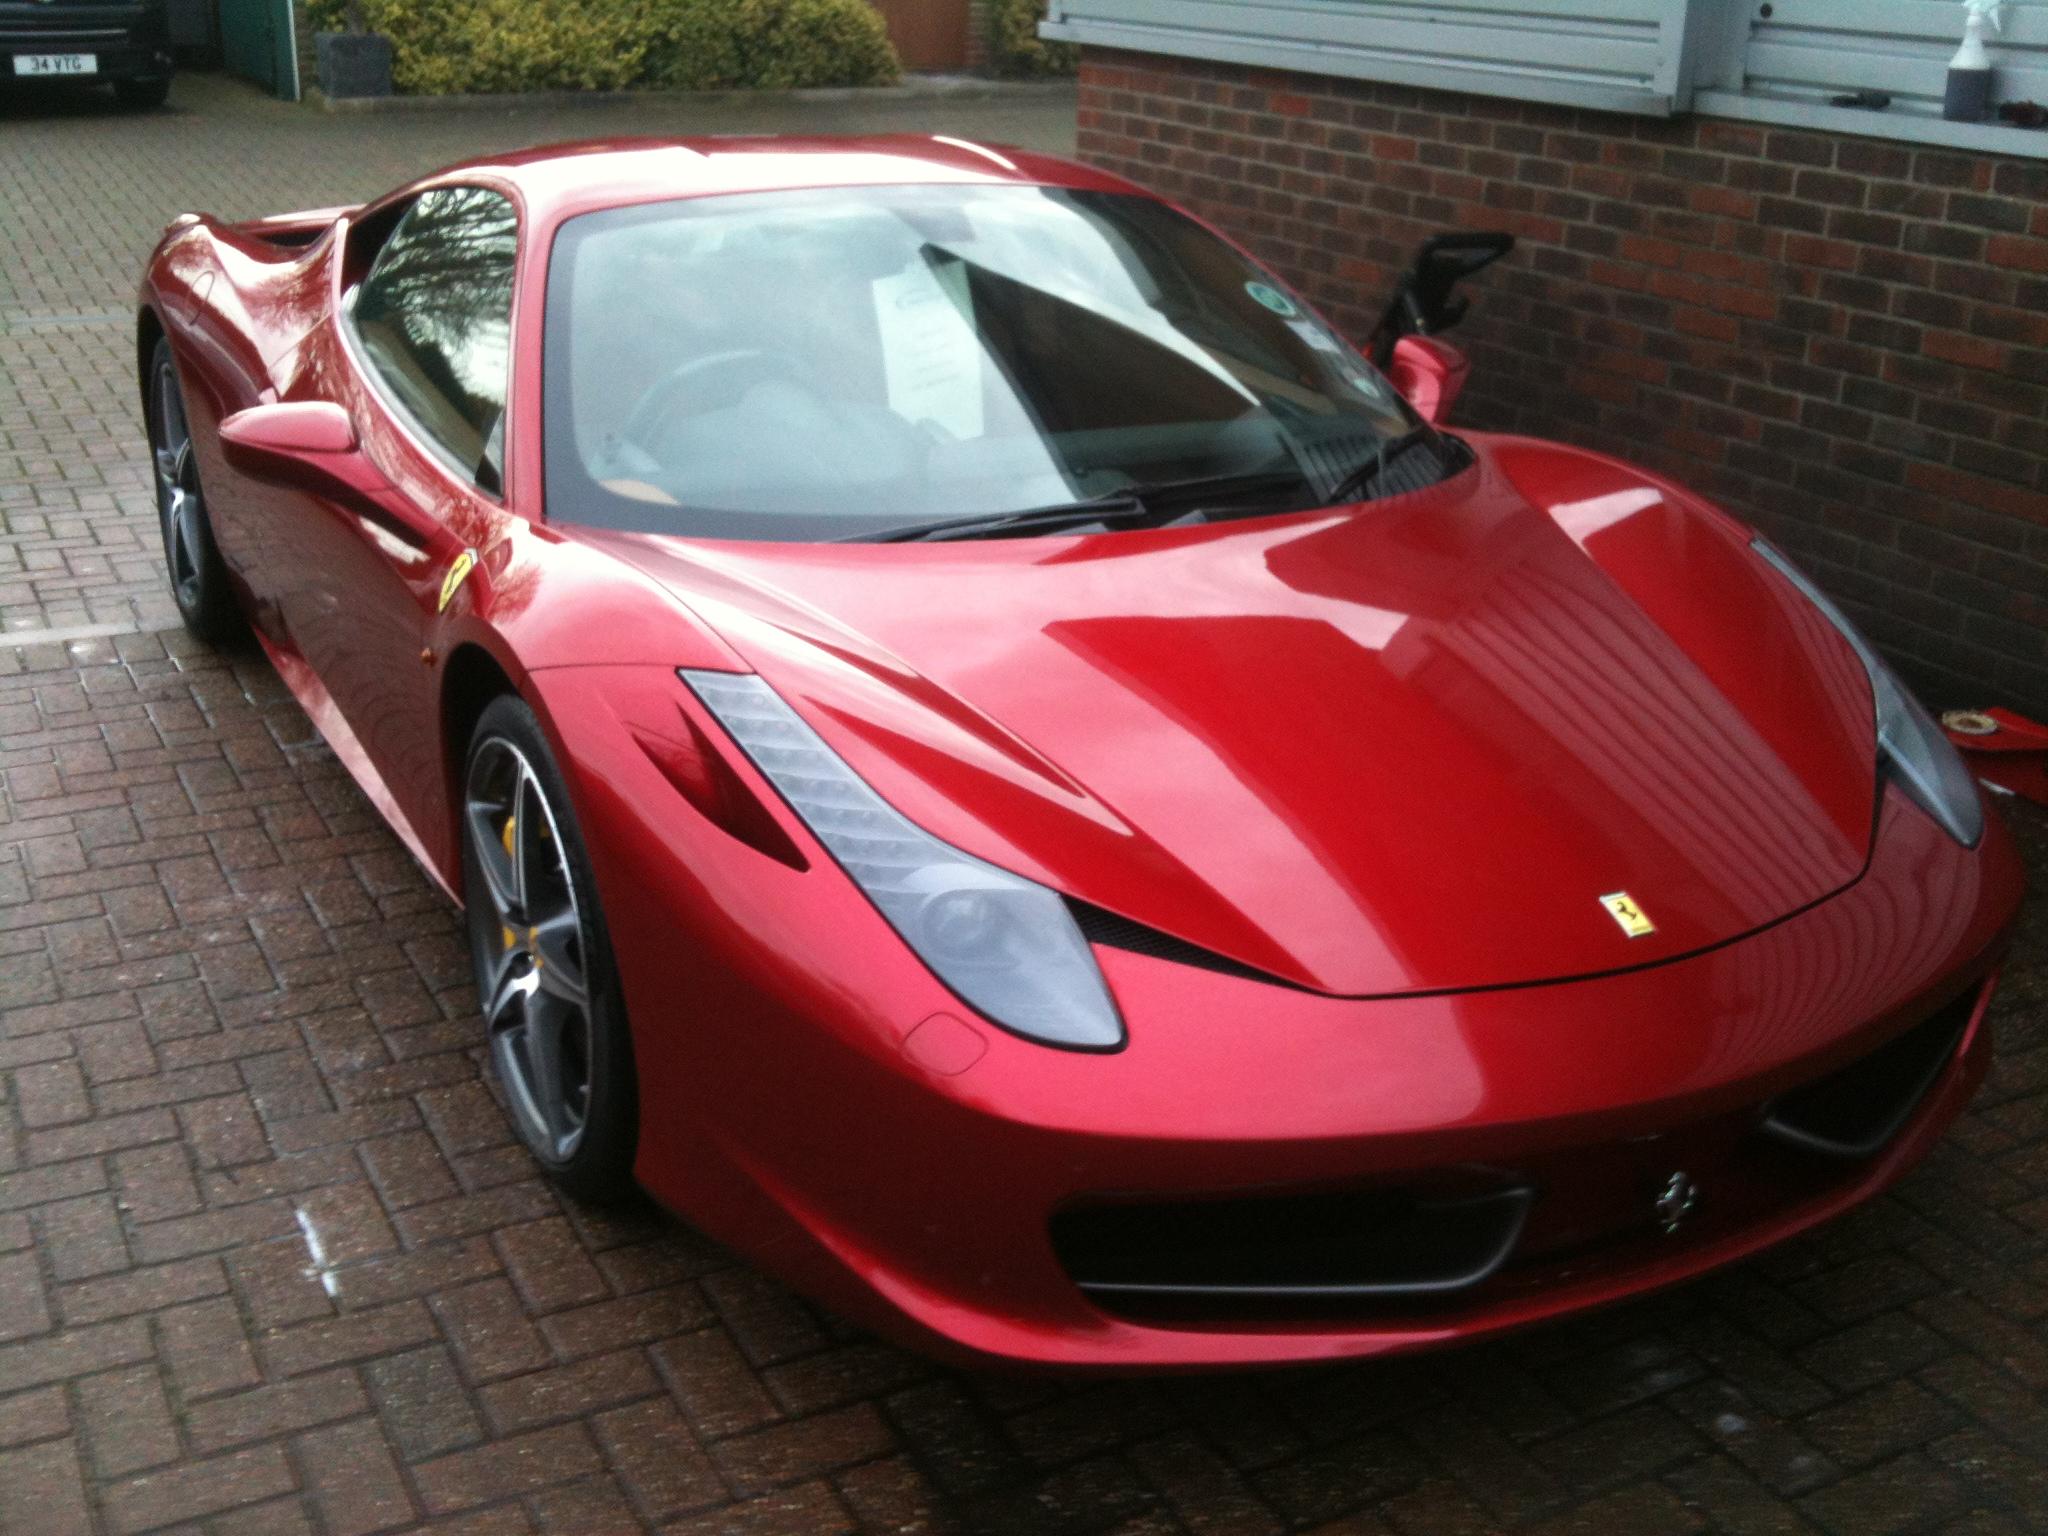 Car Body Shop >> Experienced High Quality Car Body Shop Providing Vehicle